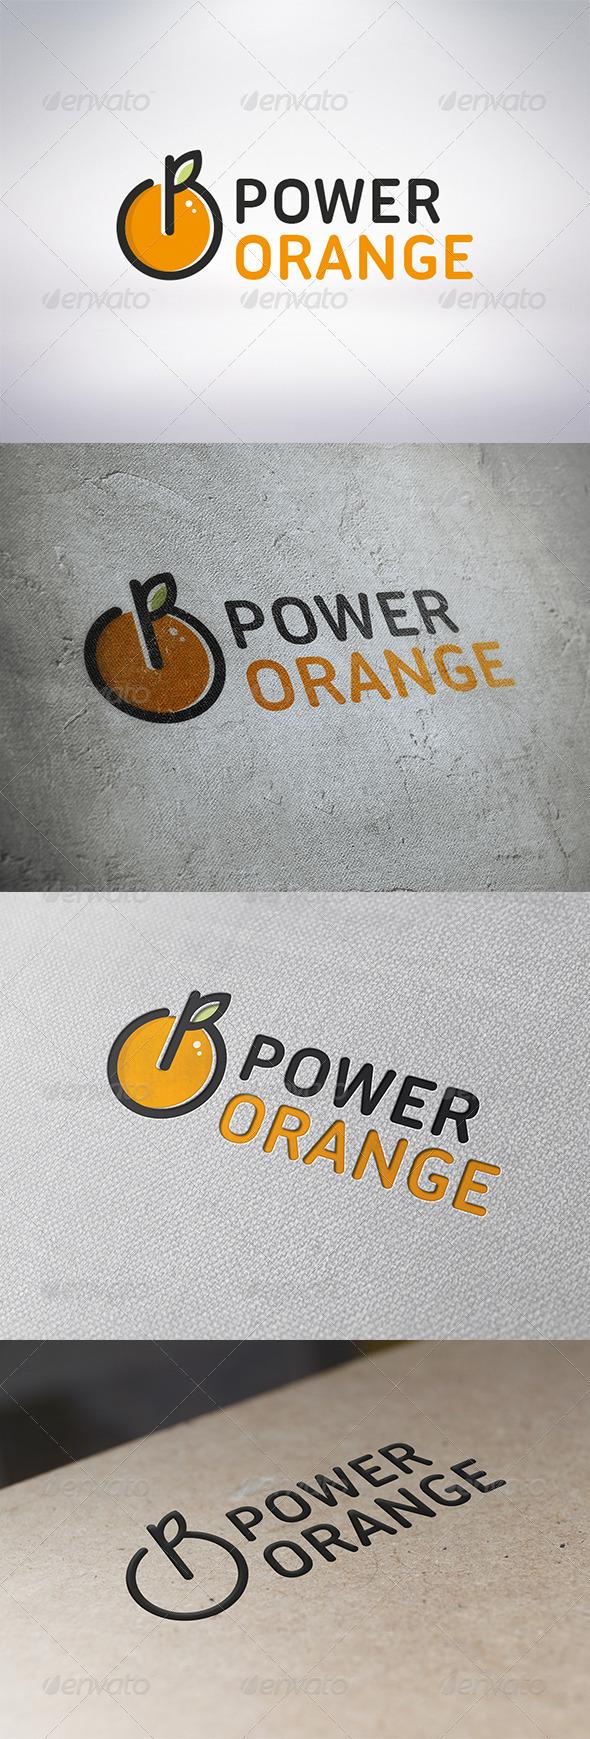 Power Orange Logo Template - Food Logo Templates